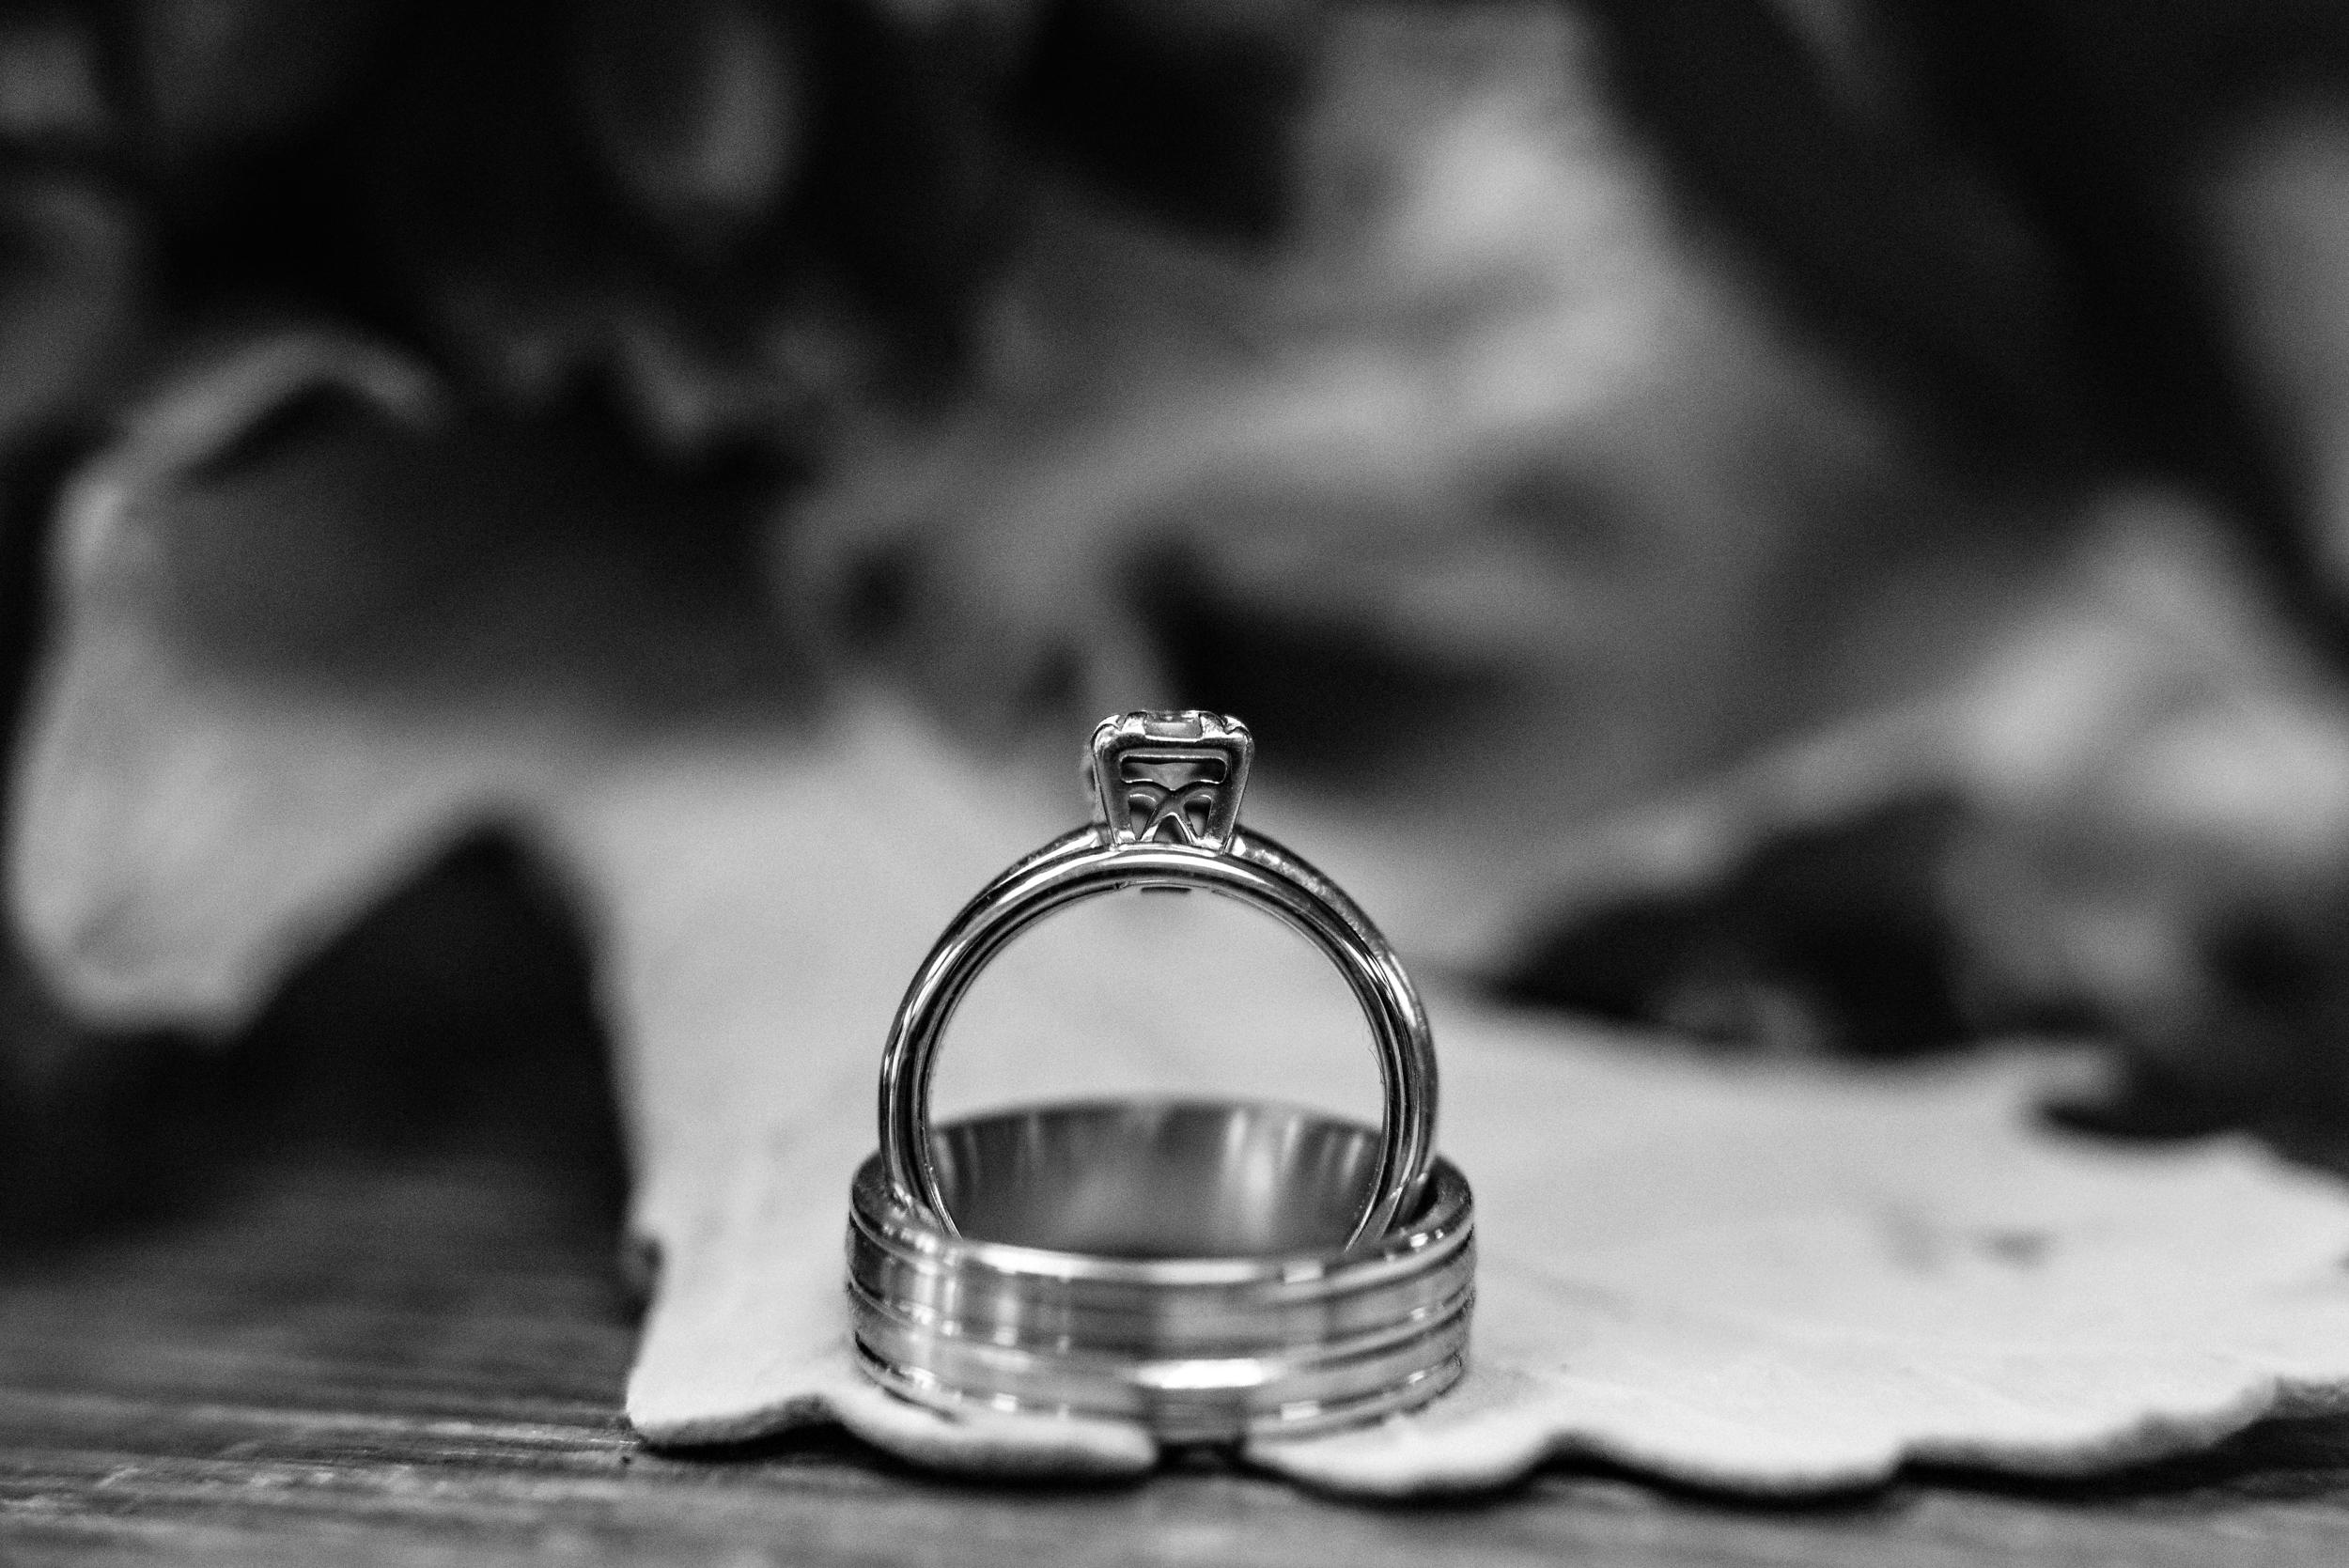 weddings, lindsborg kansas, natural light, shannon schneider photography